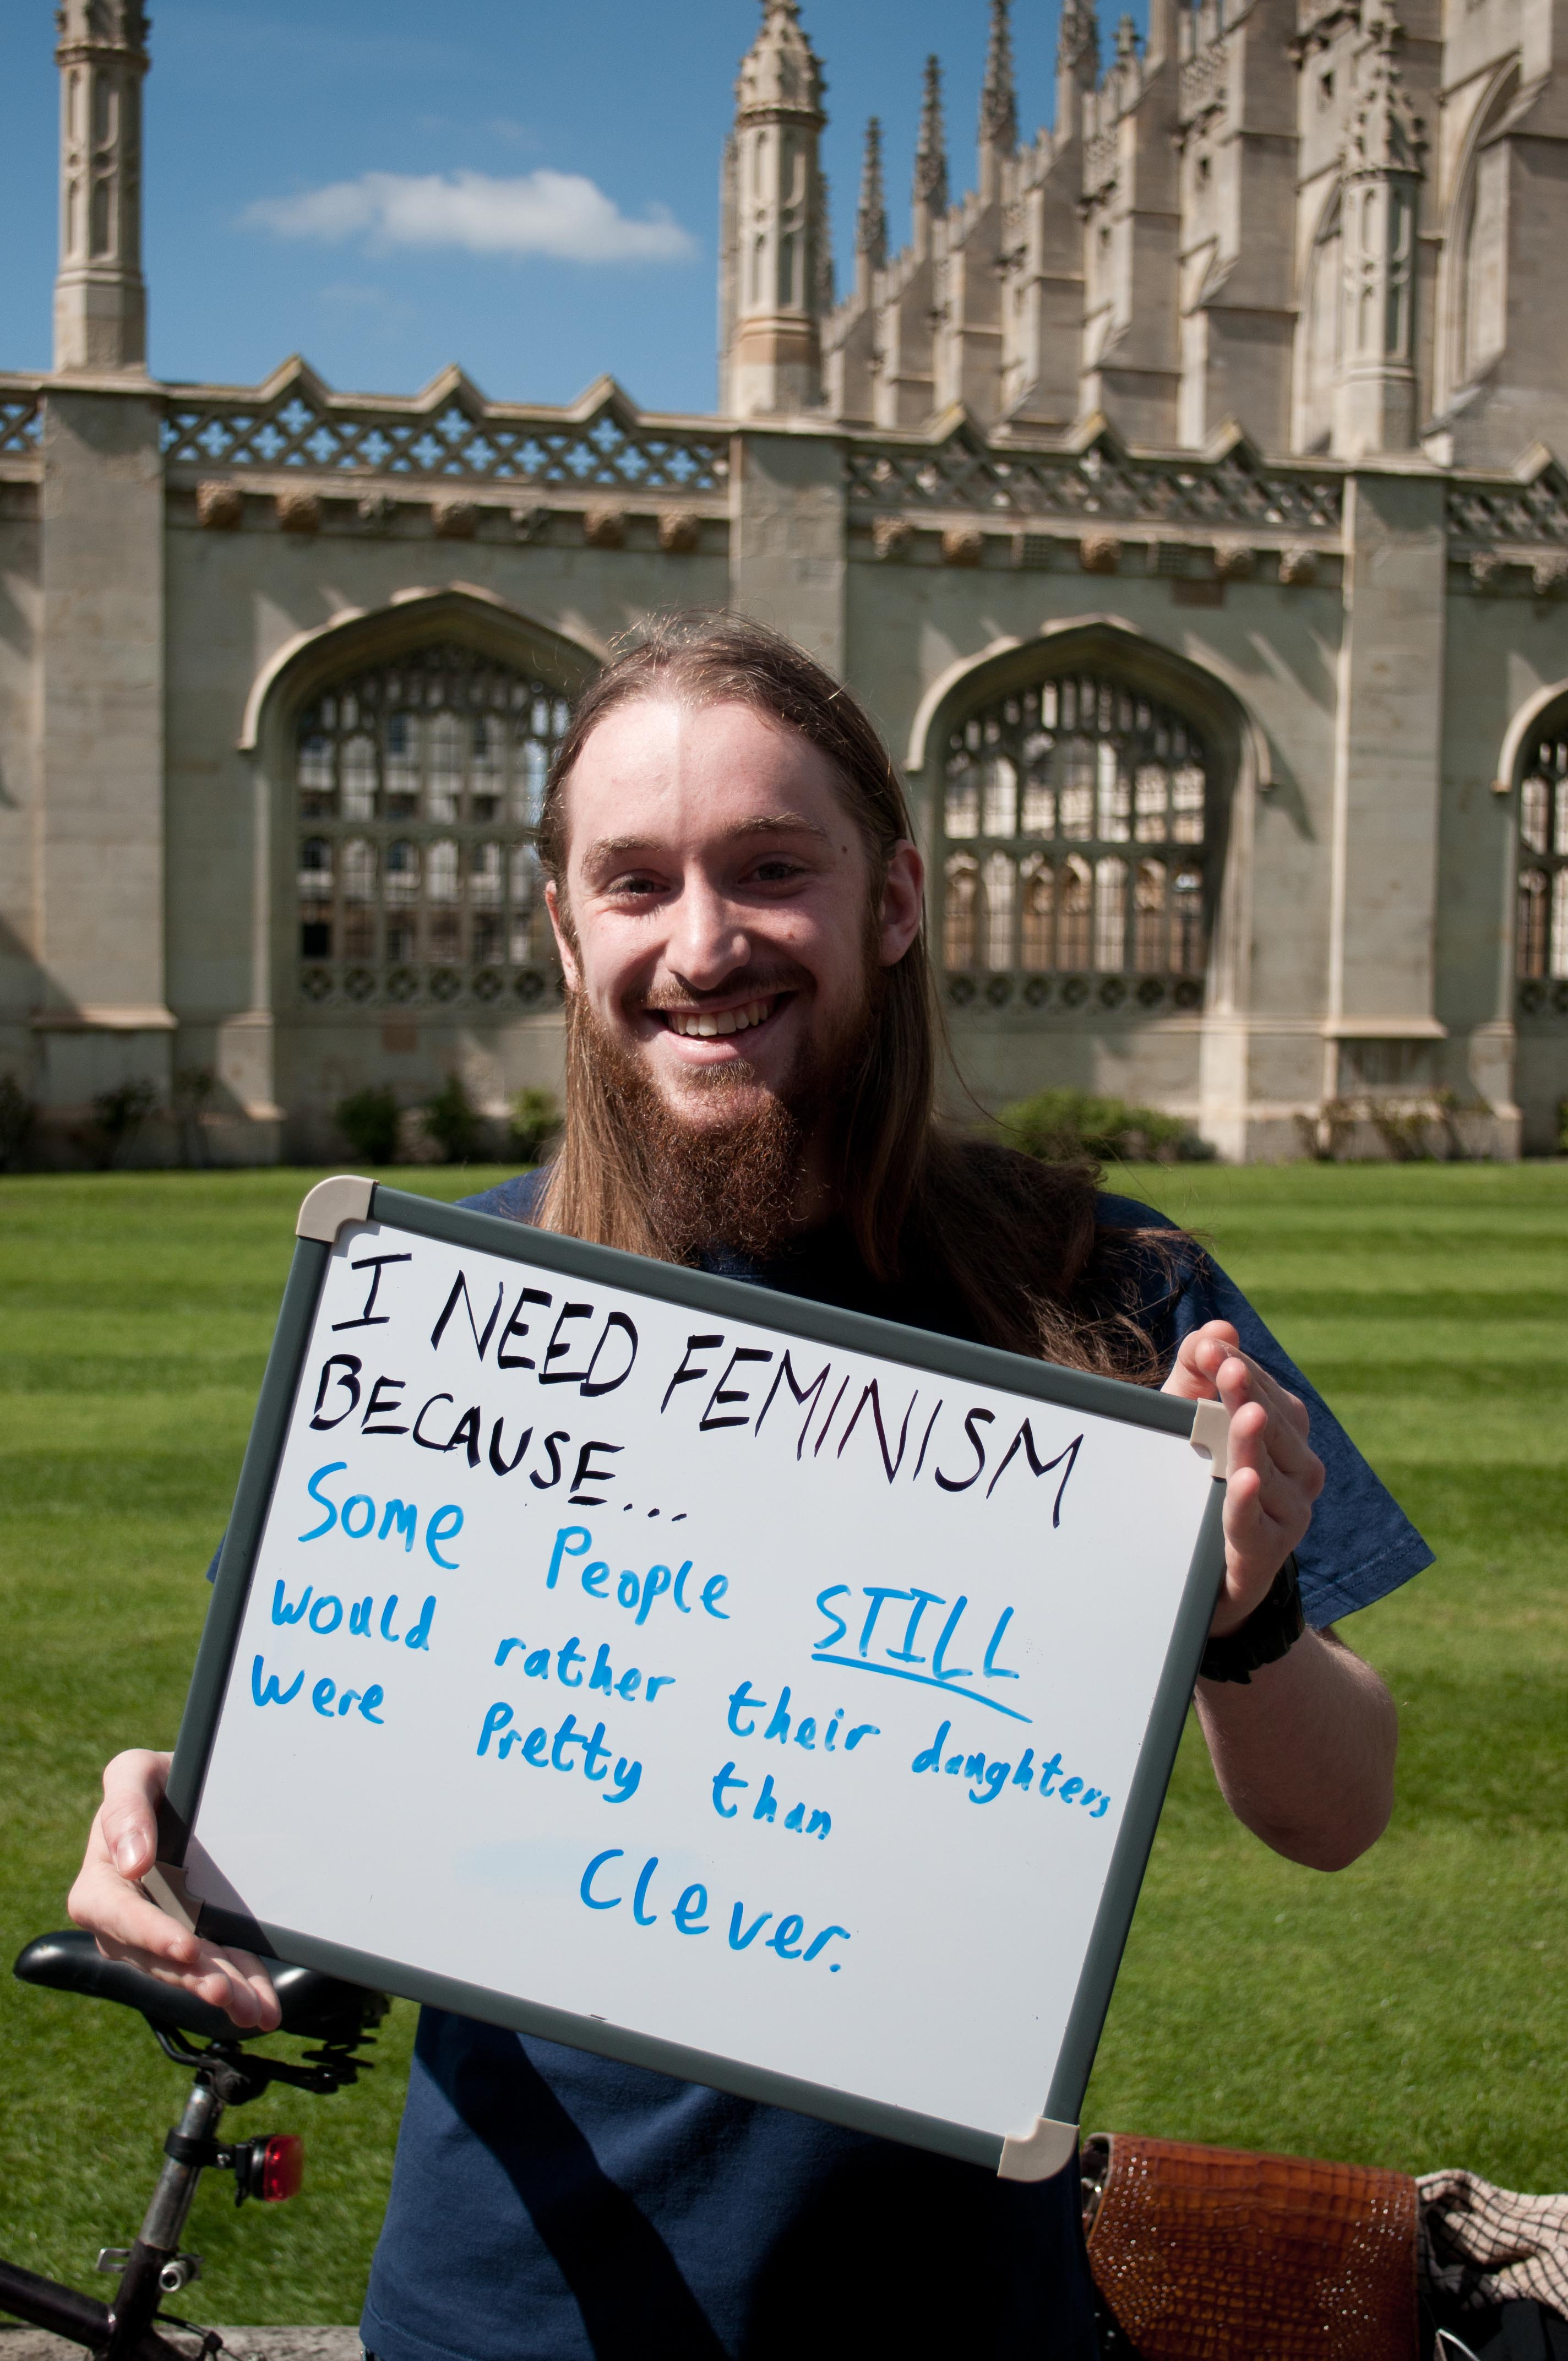 u0026quot i need feminism because    u0026quot   in pictures